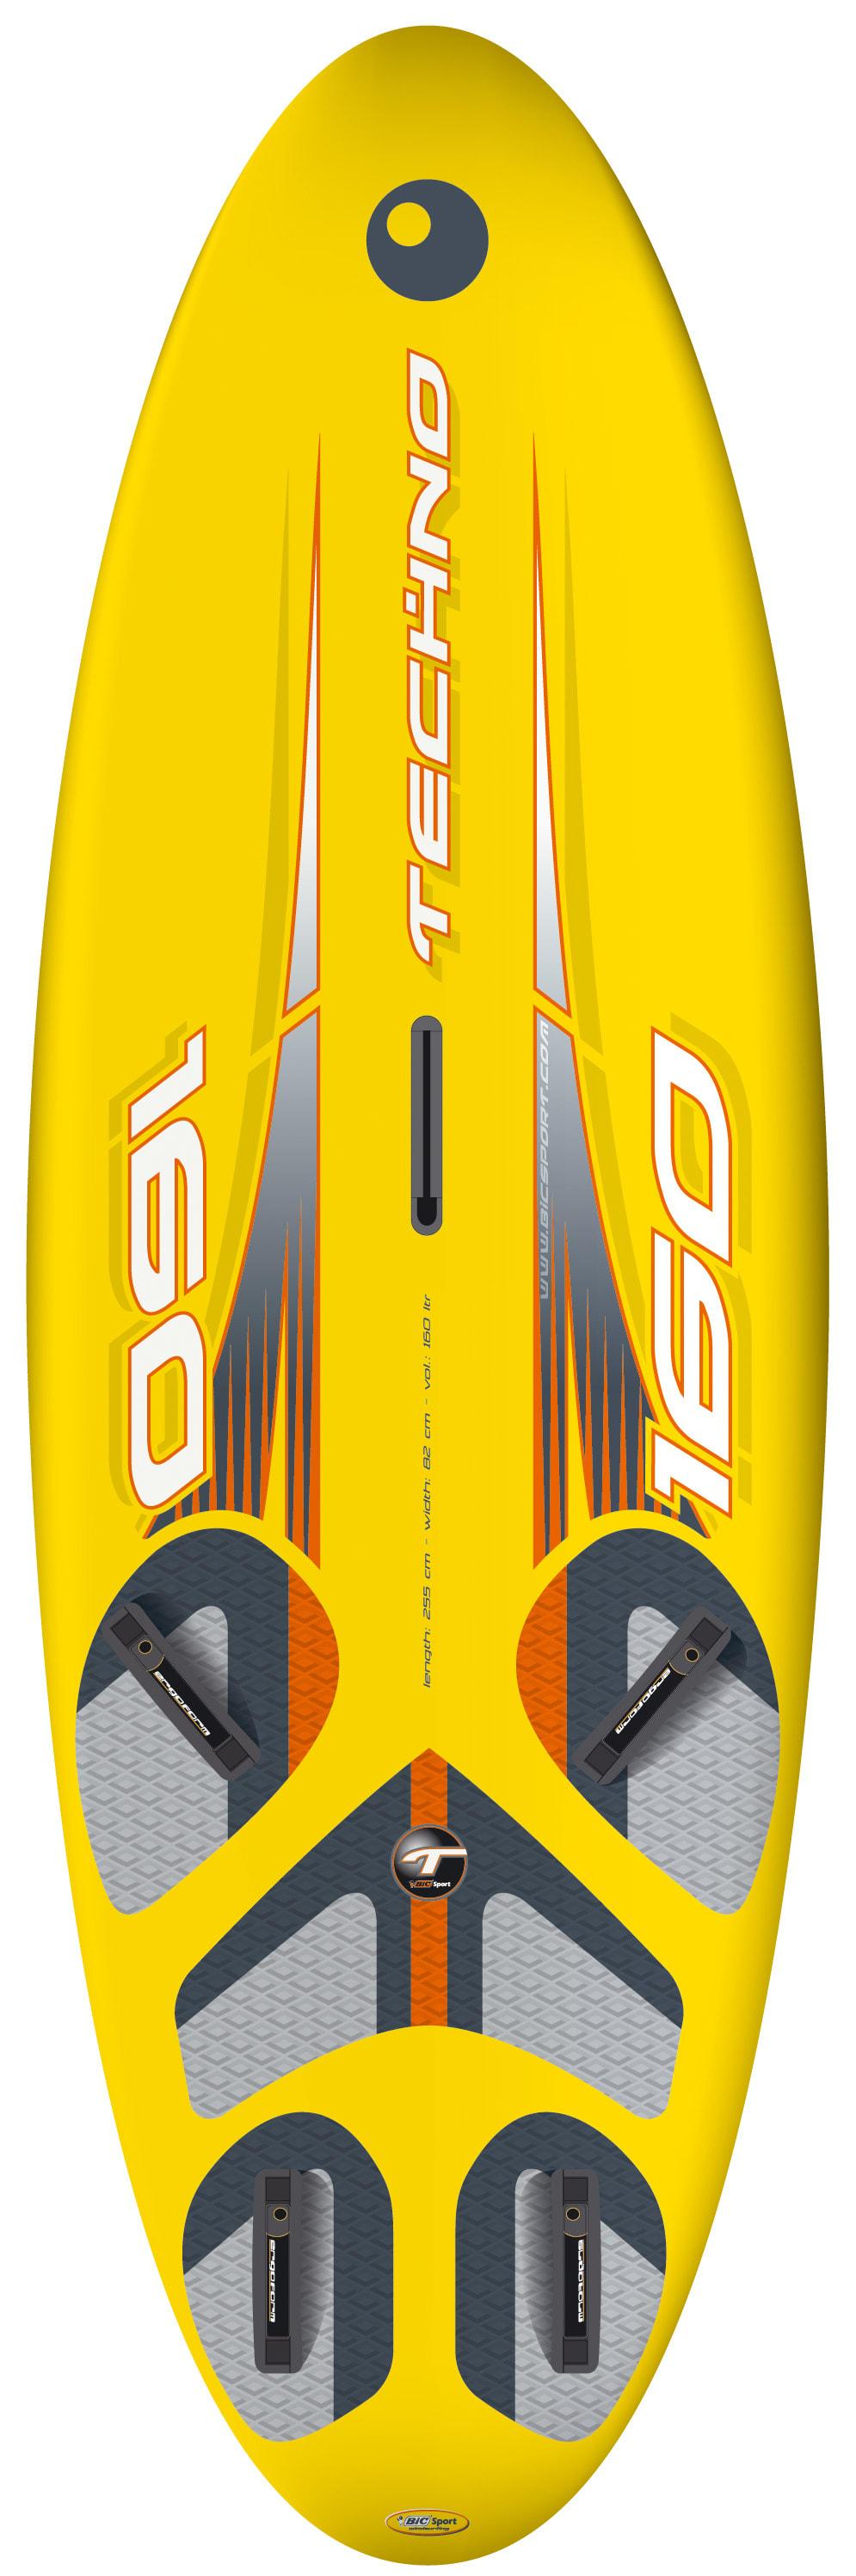 Bic Techno Windsurf Board 160 on PopScreen